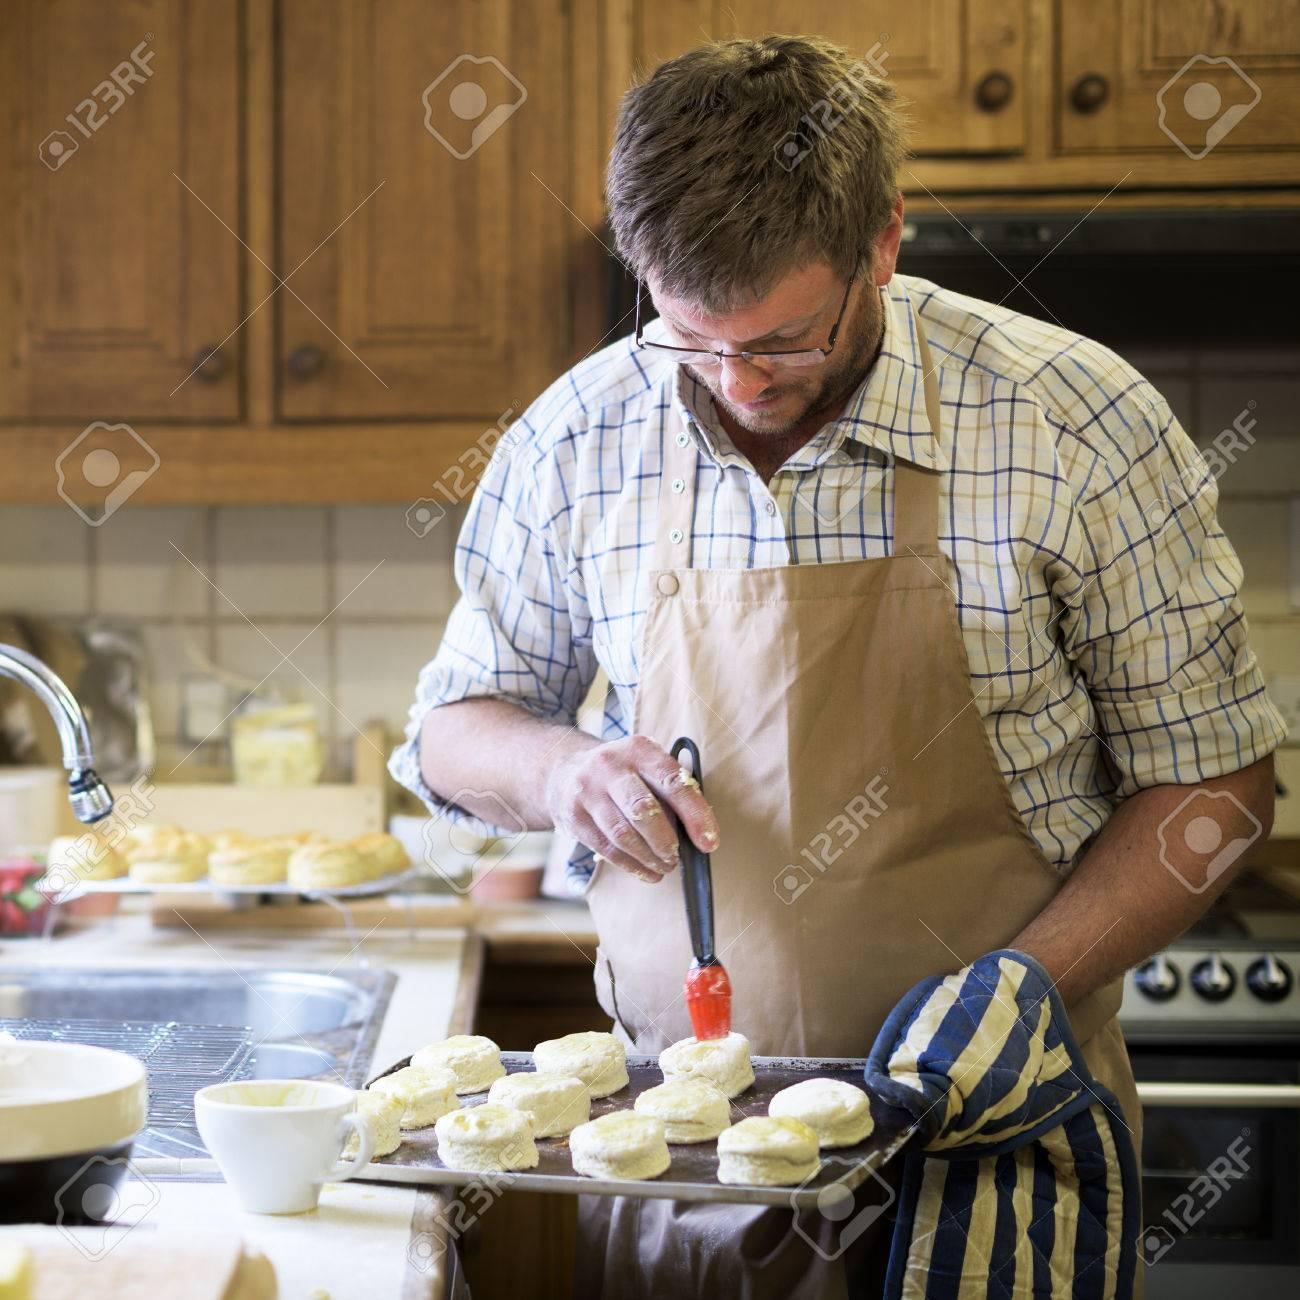 Hombre Delantal De Cocina Para Hornear Panadera Concept Fotos